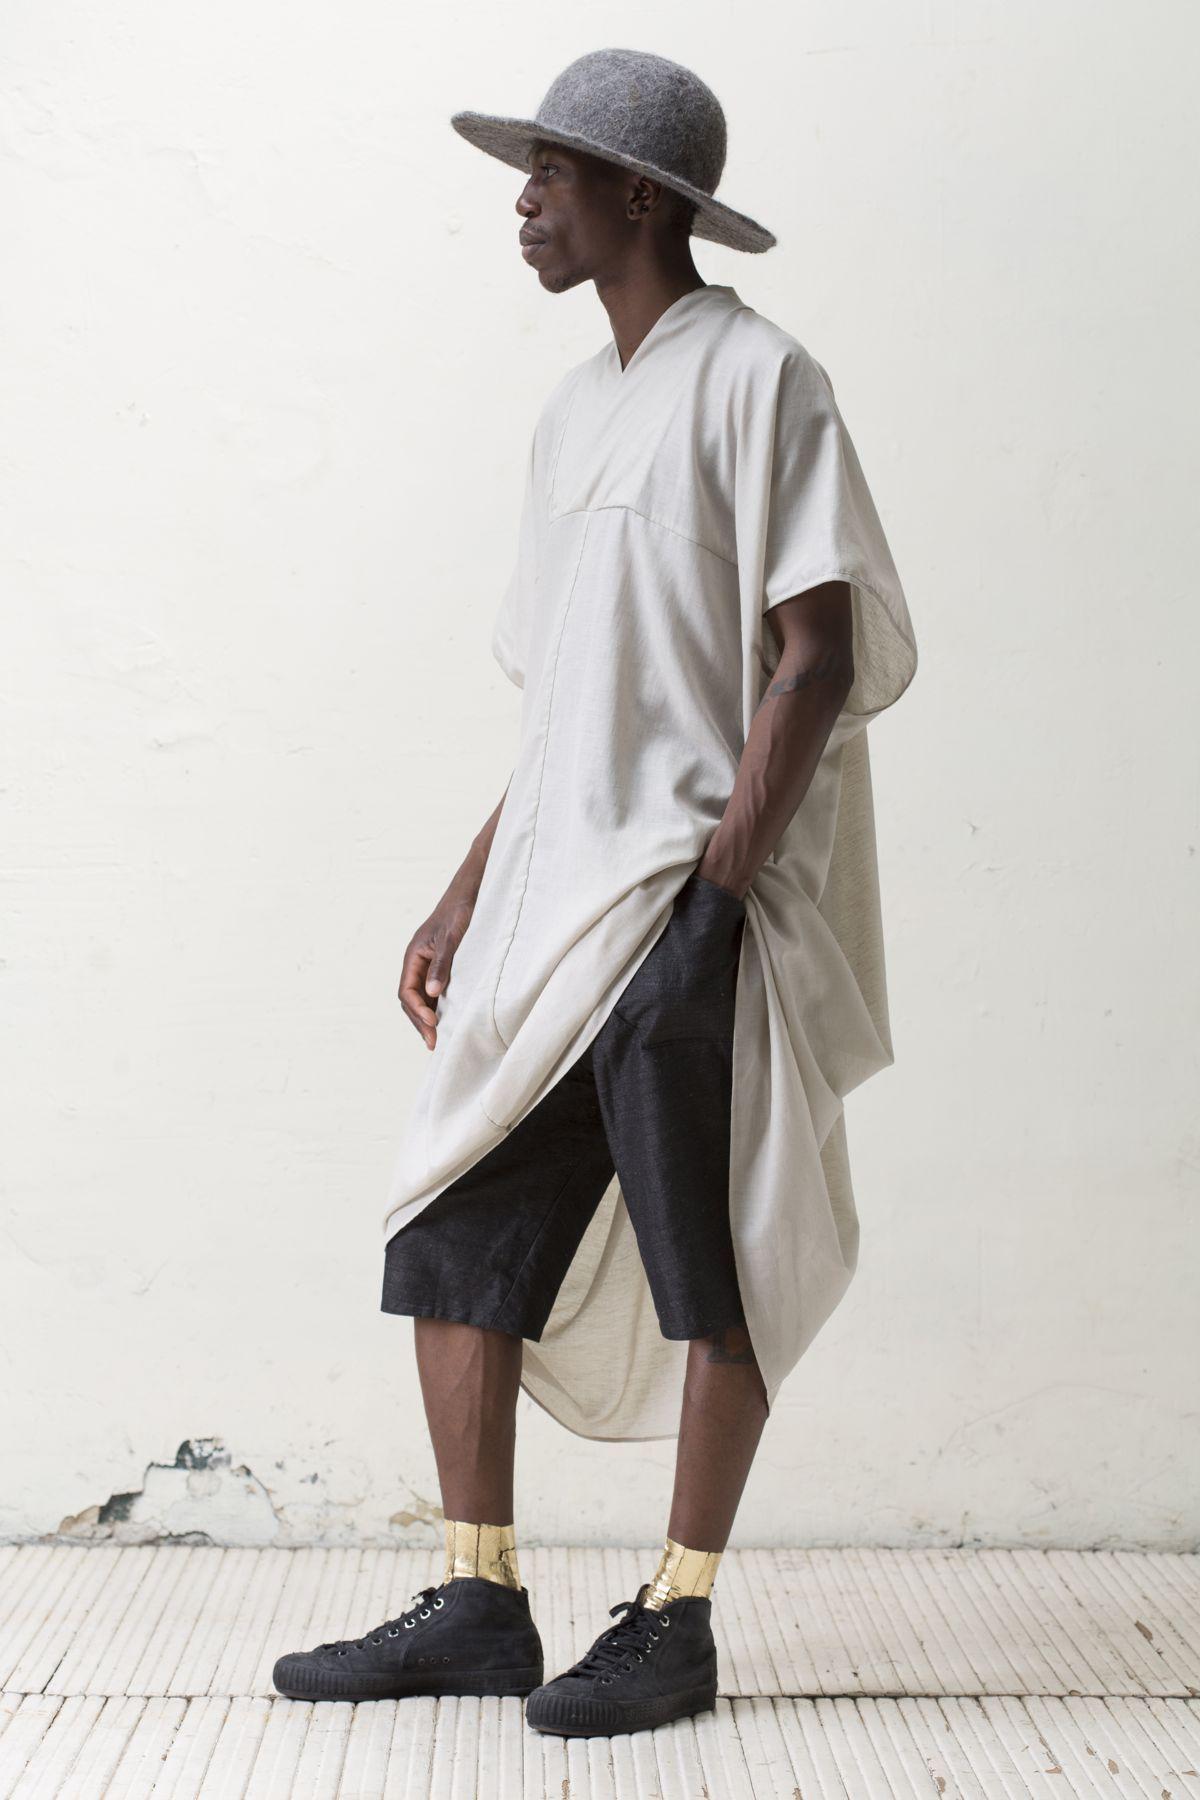 Jan Jan Van Essche Collection 5 Inite Fashion Mens Fashion Androgynous Fashion